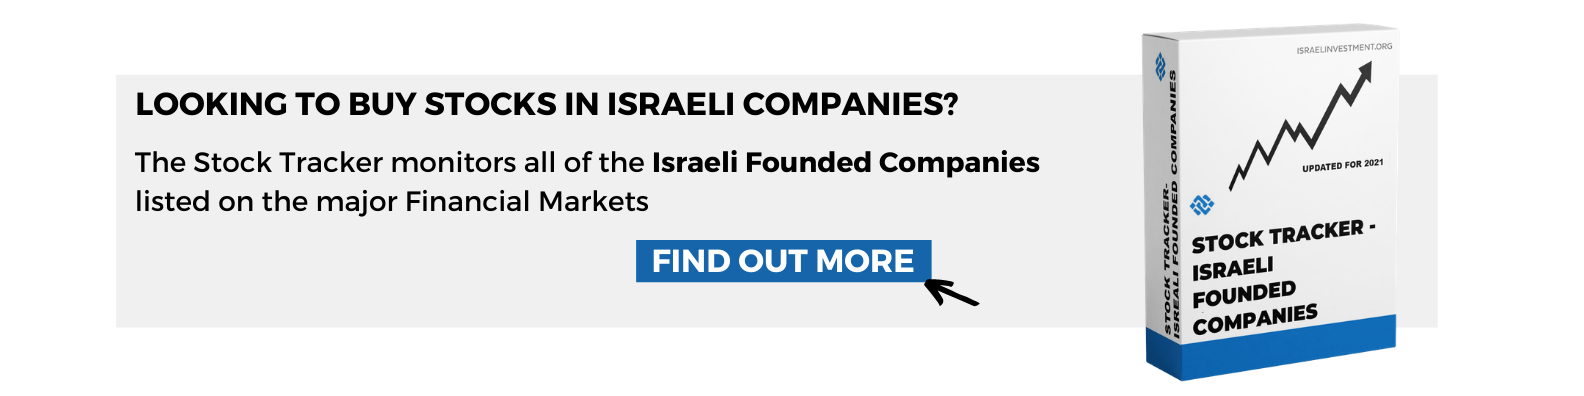 Invest in Israeli companies